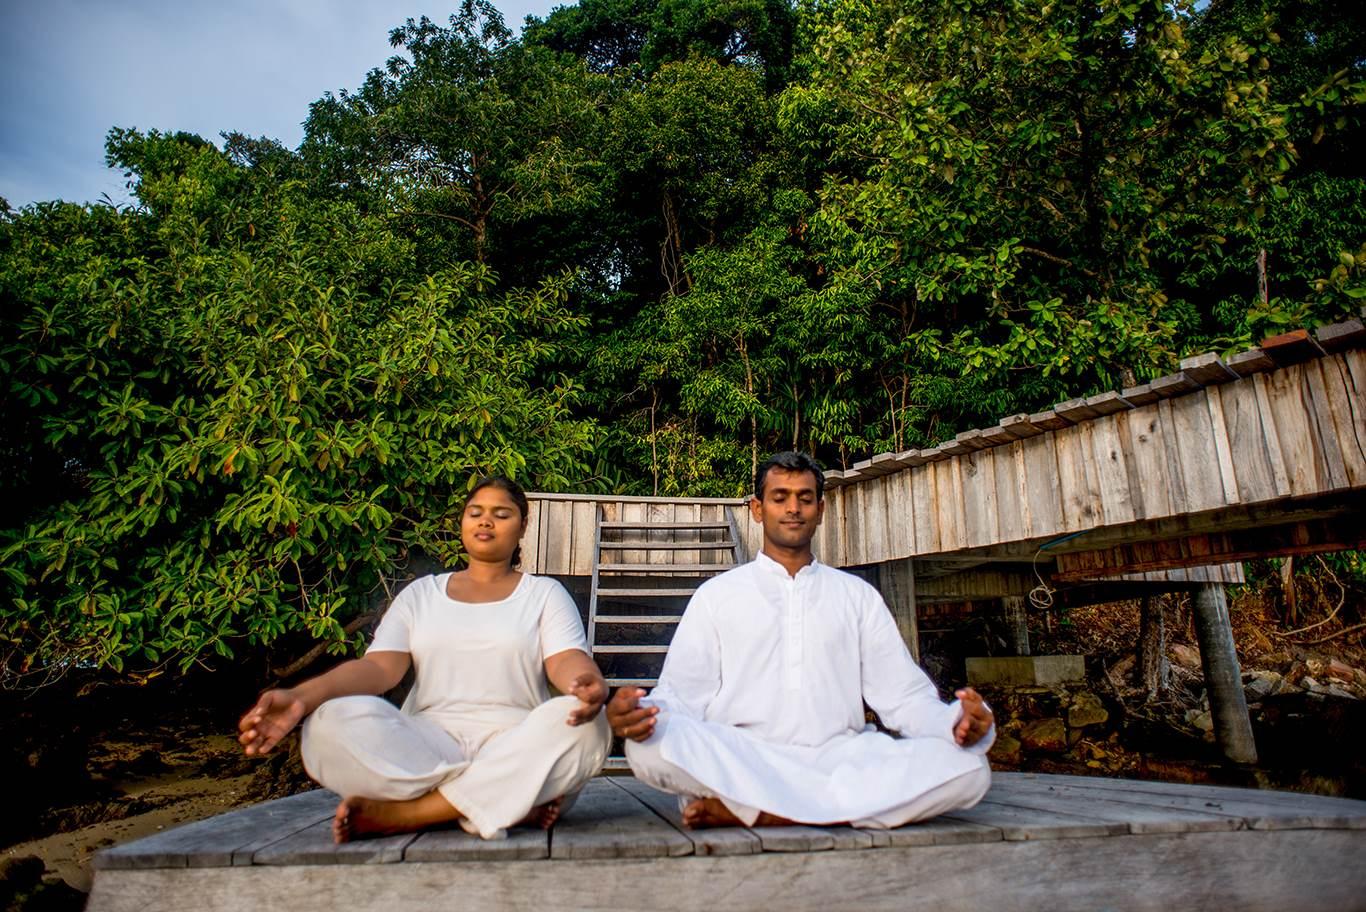 Afternoon Meditation